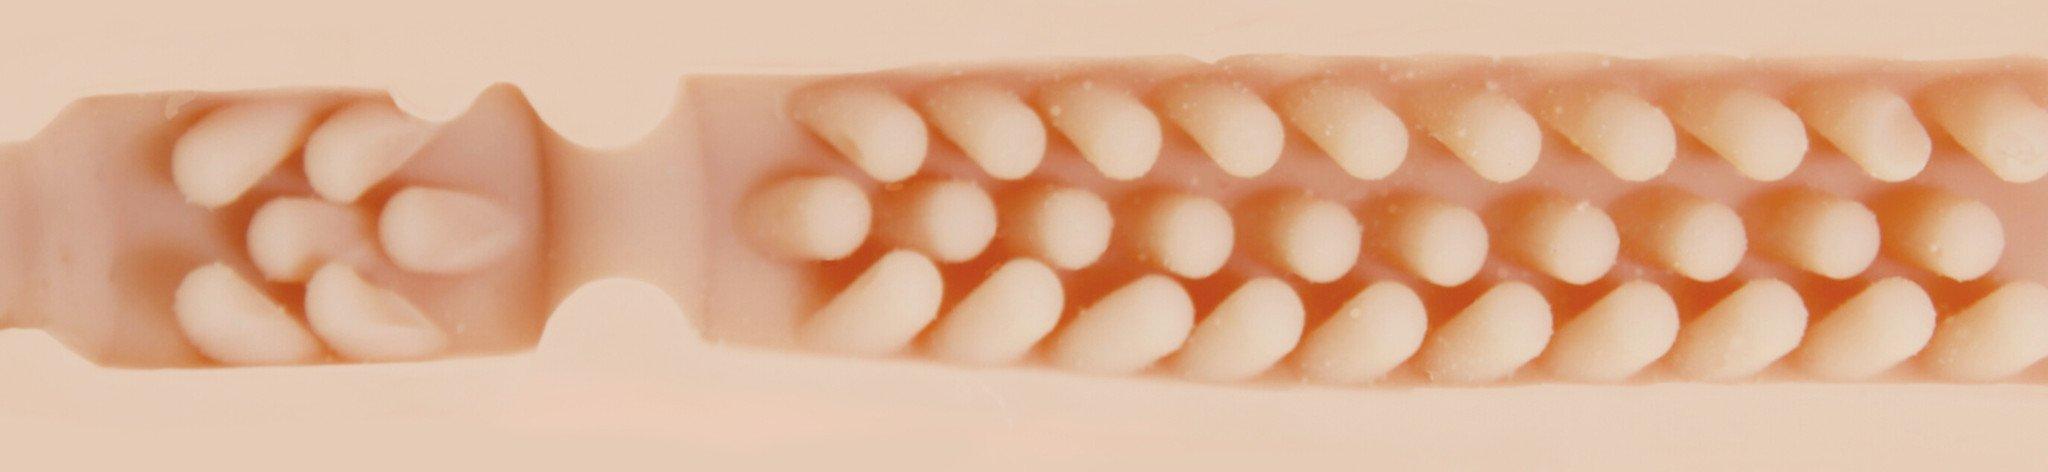 Barracuda Fleshlight Girls Texture Image